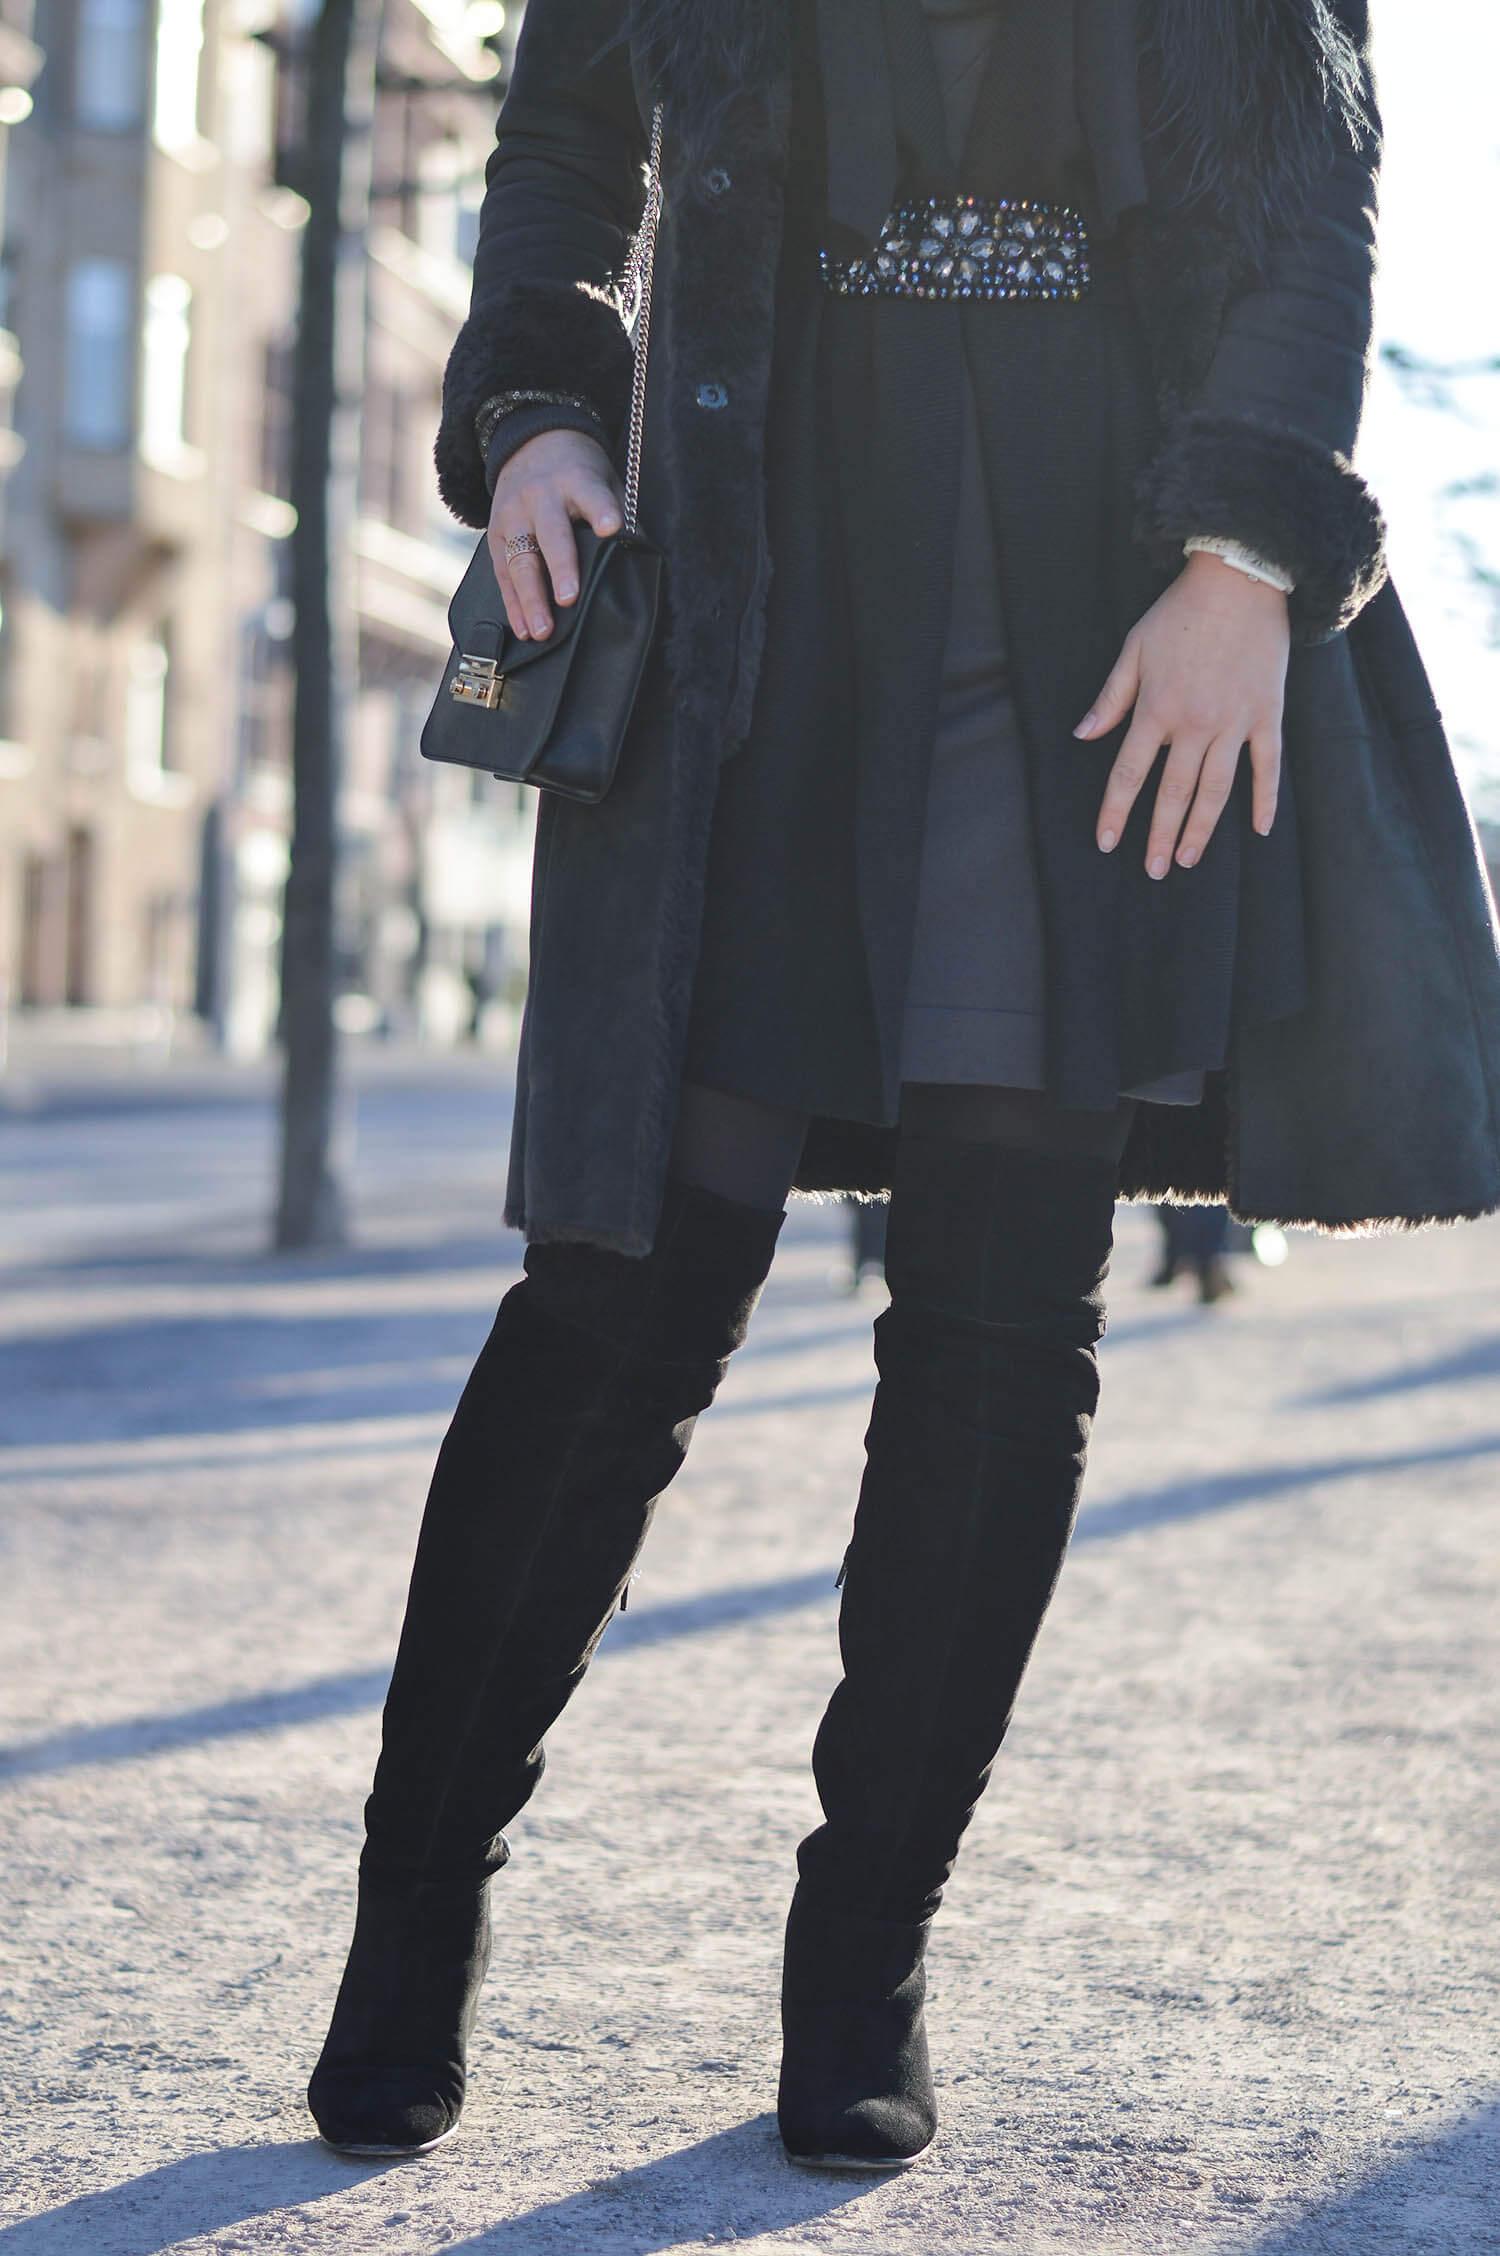 Kationette-fashionblog-Outfit-Shadesofgrey-Shearling-Knit-Overknees-Dusseldorf-furla